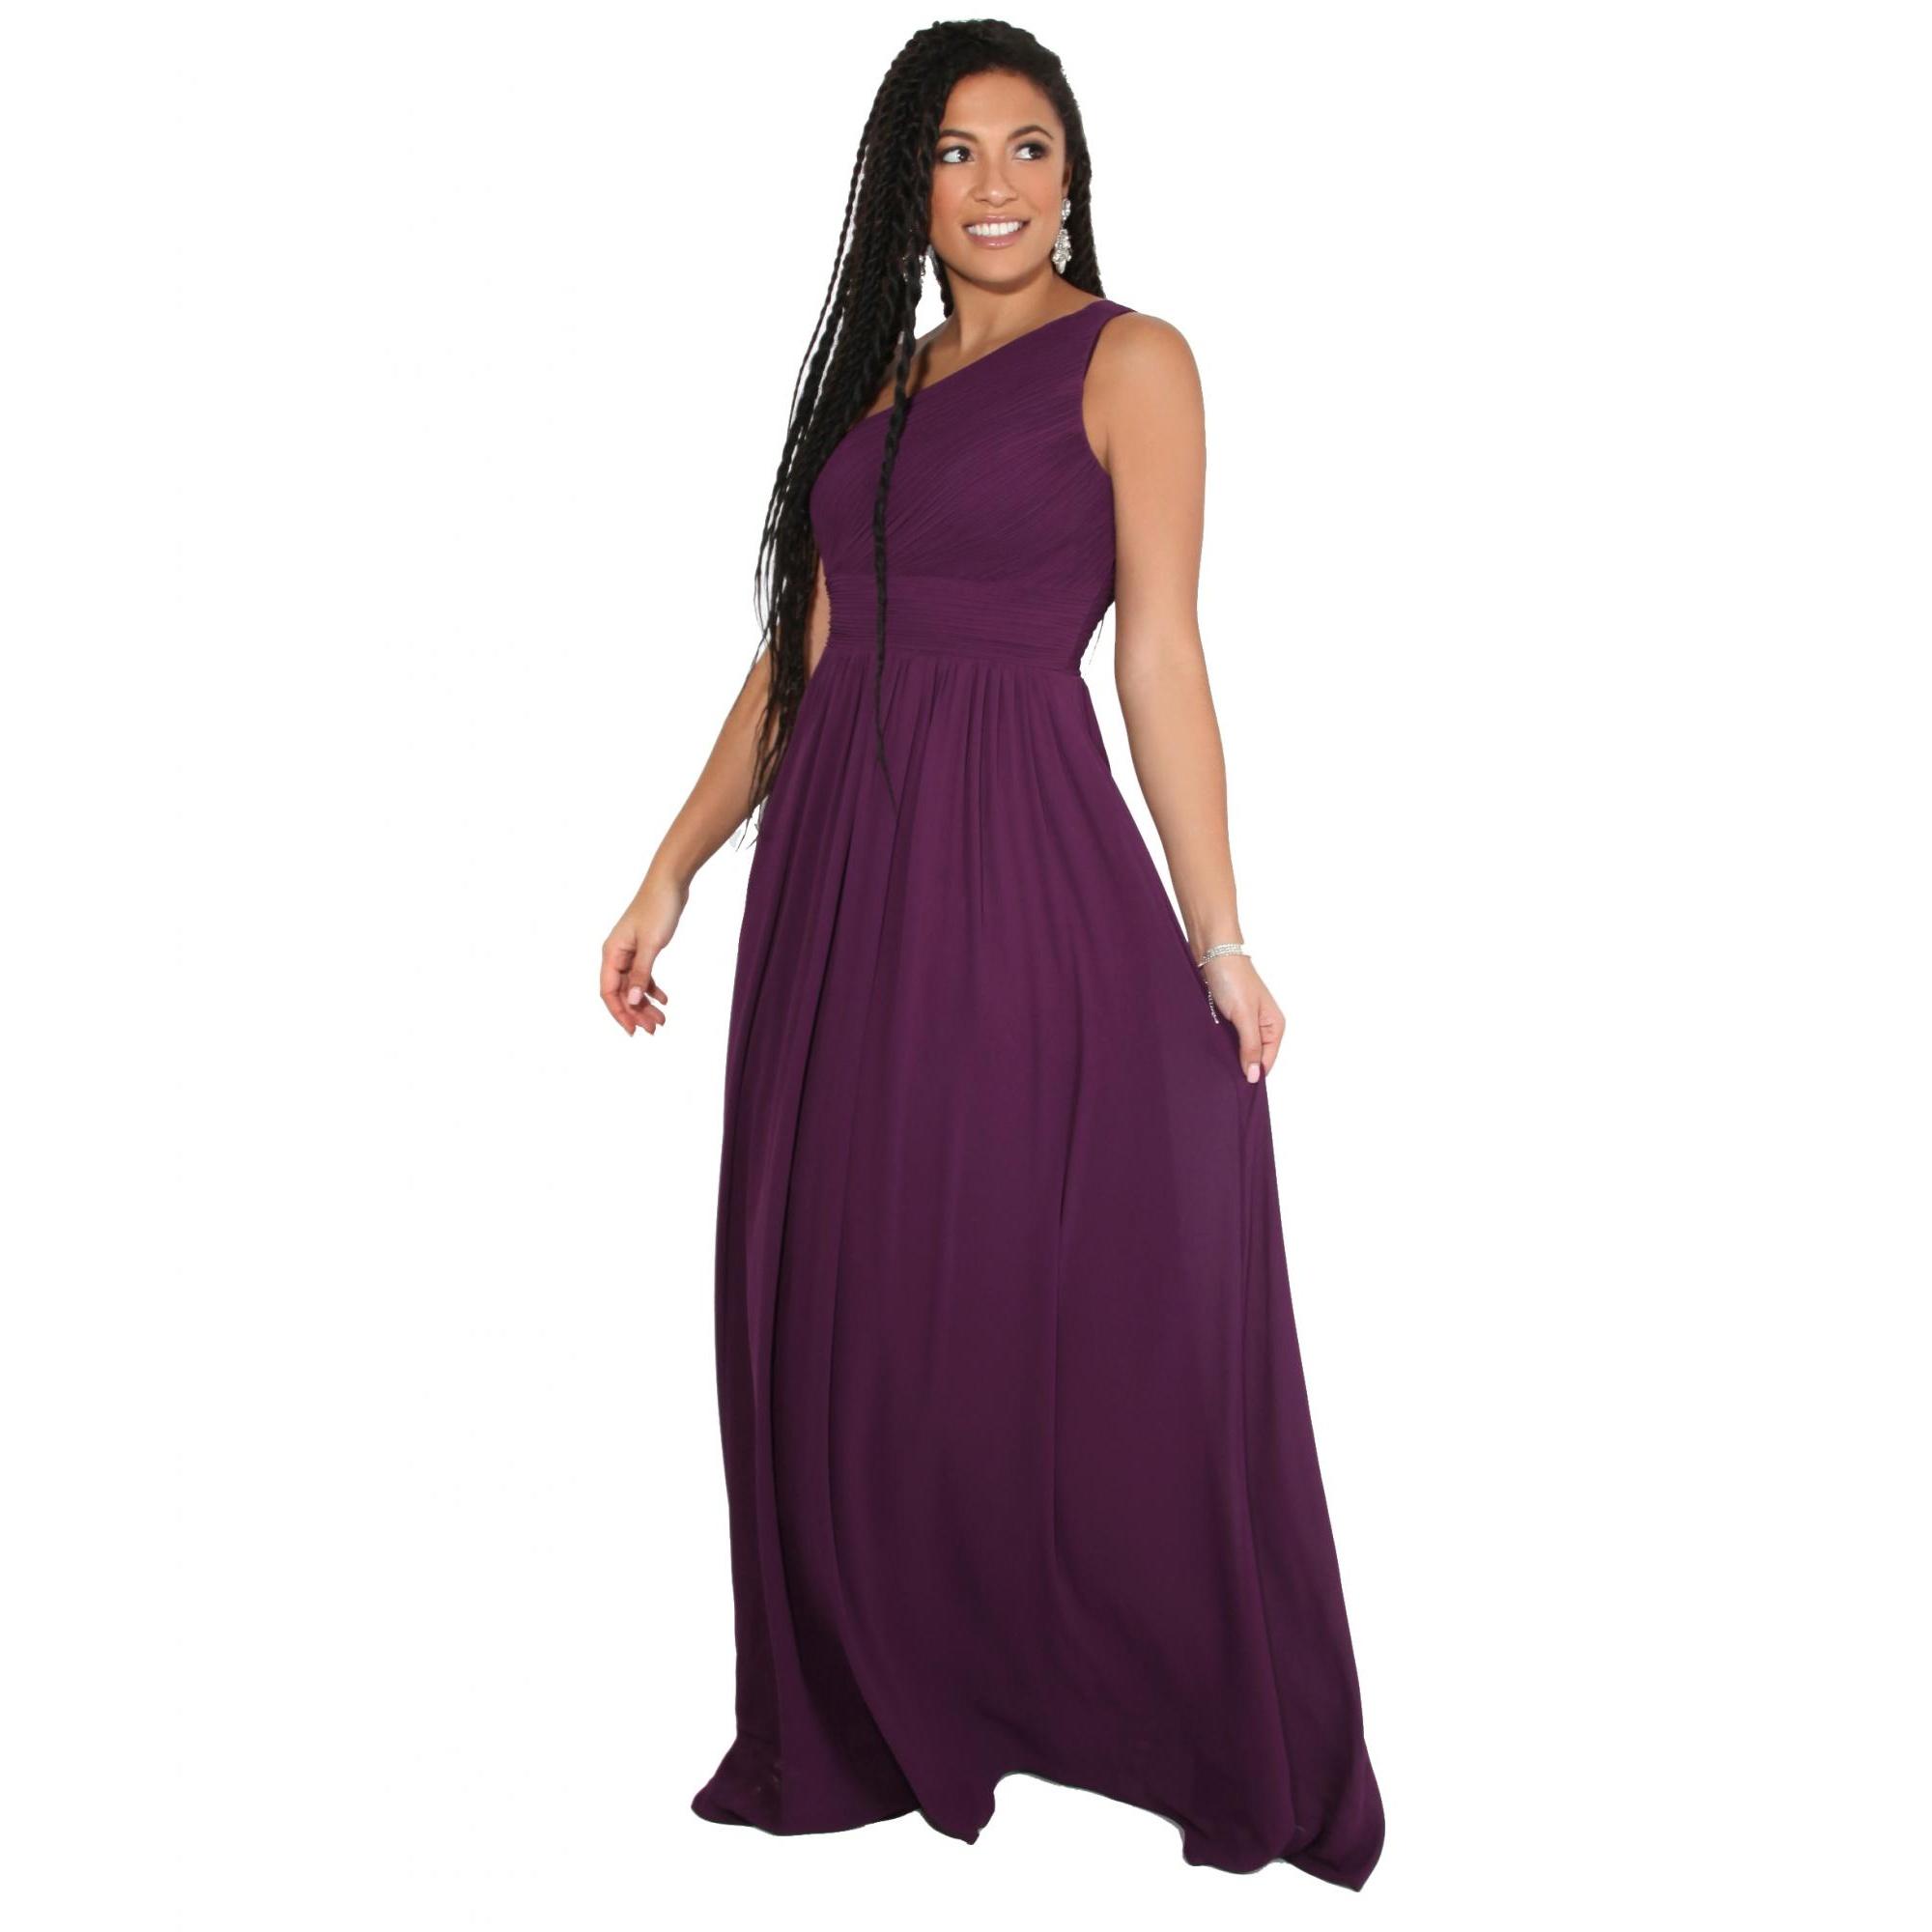 Krisp Womens/Ladies One Shoulder Evening Maxi Dress (8 UK) (Aubergine Purple)